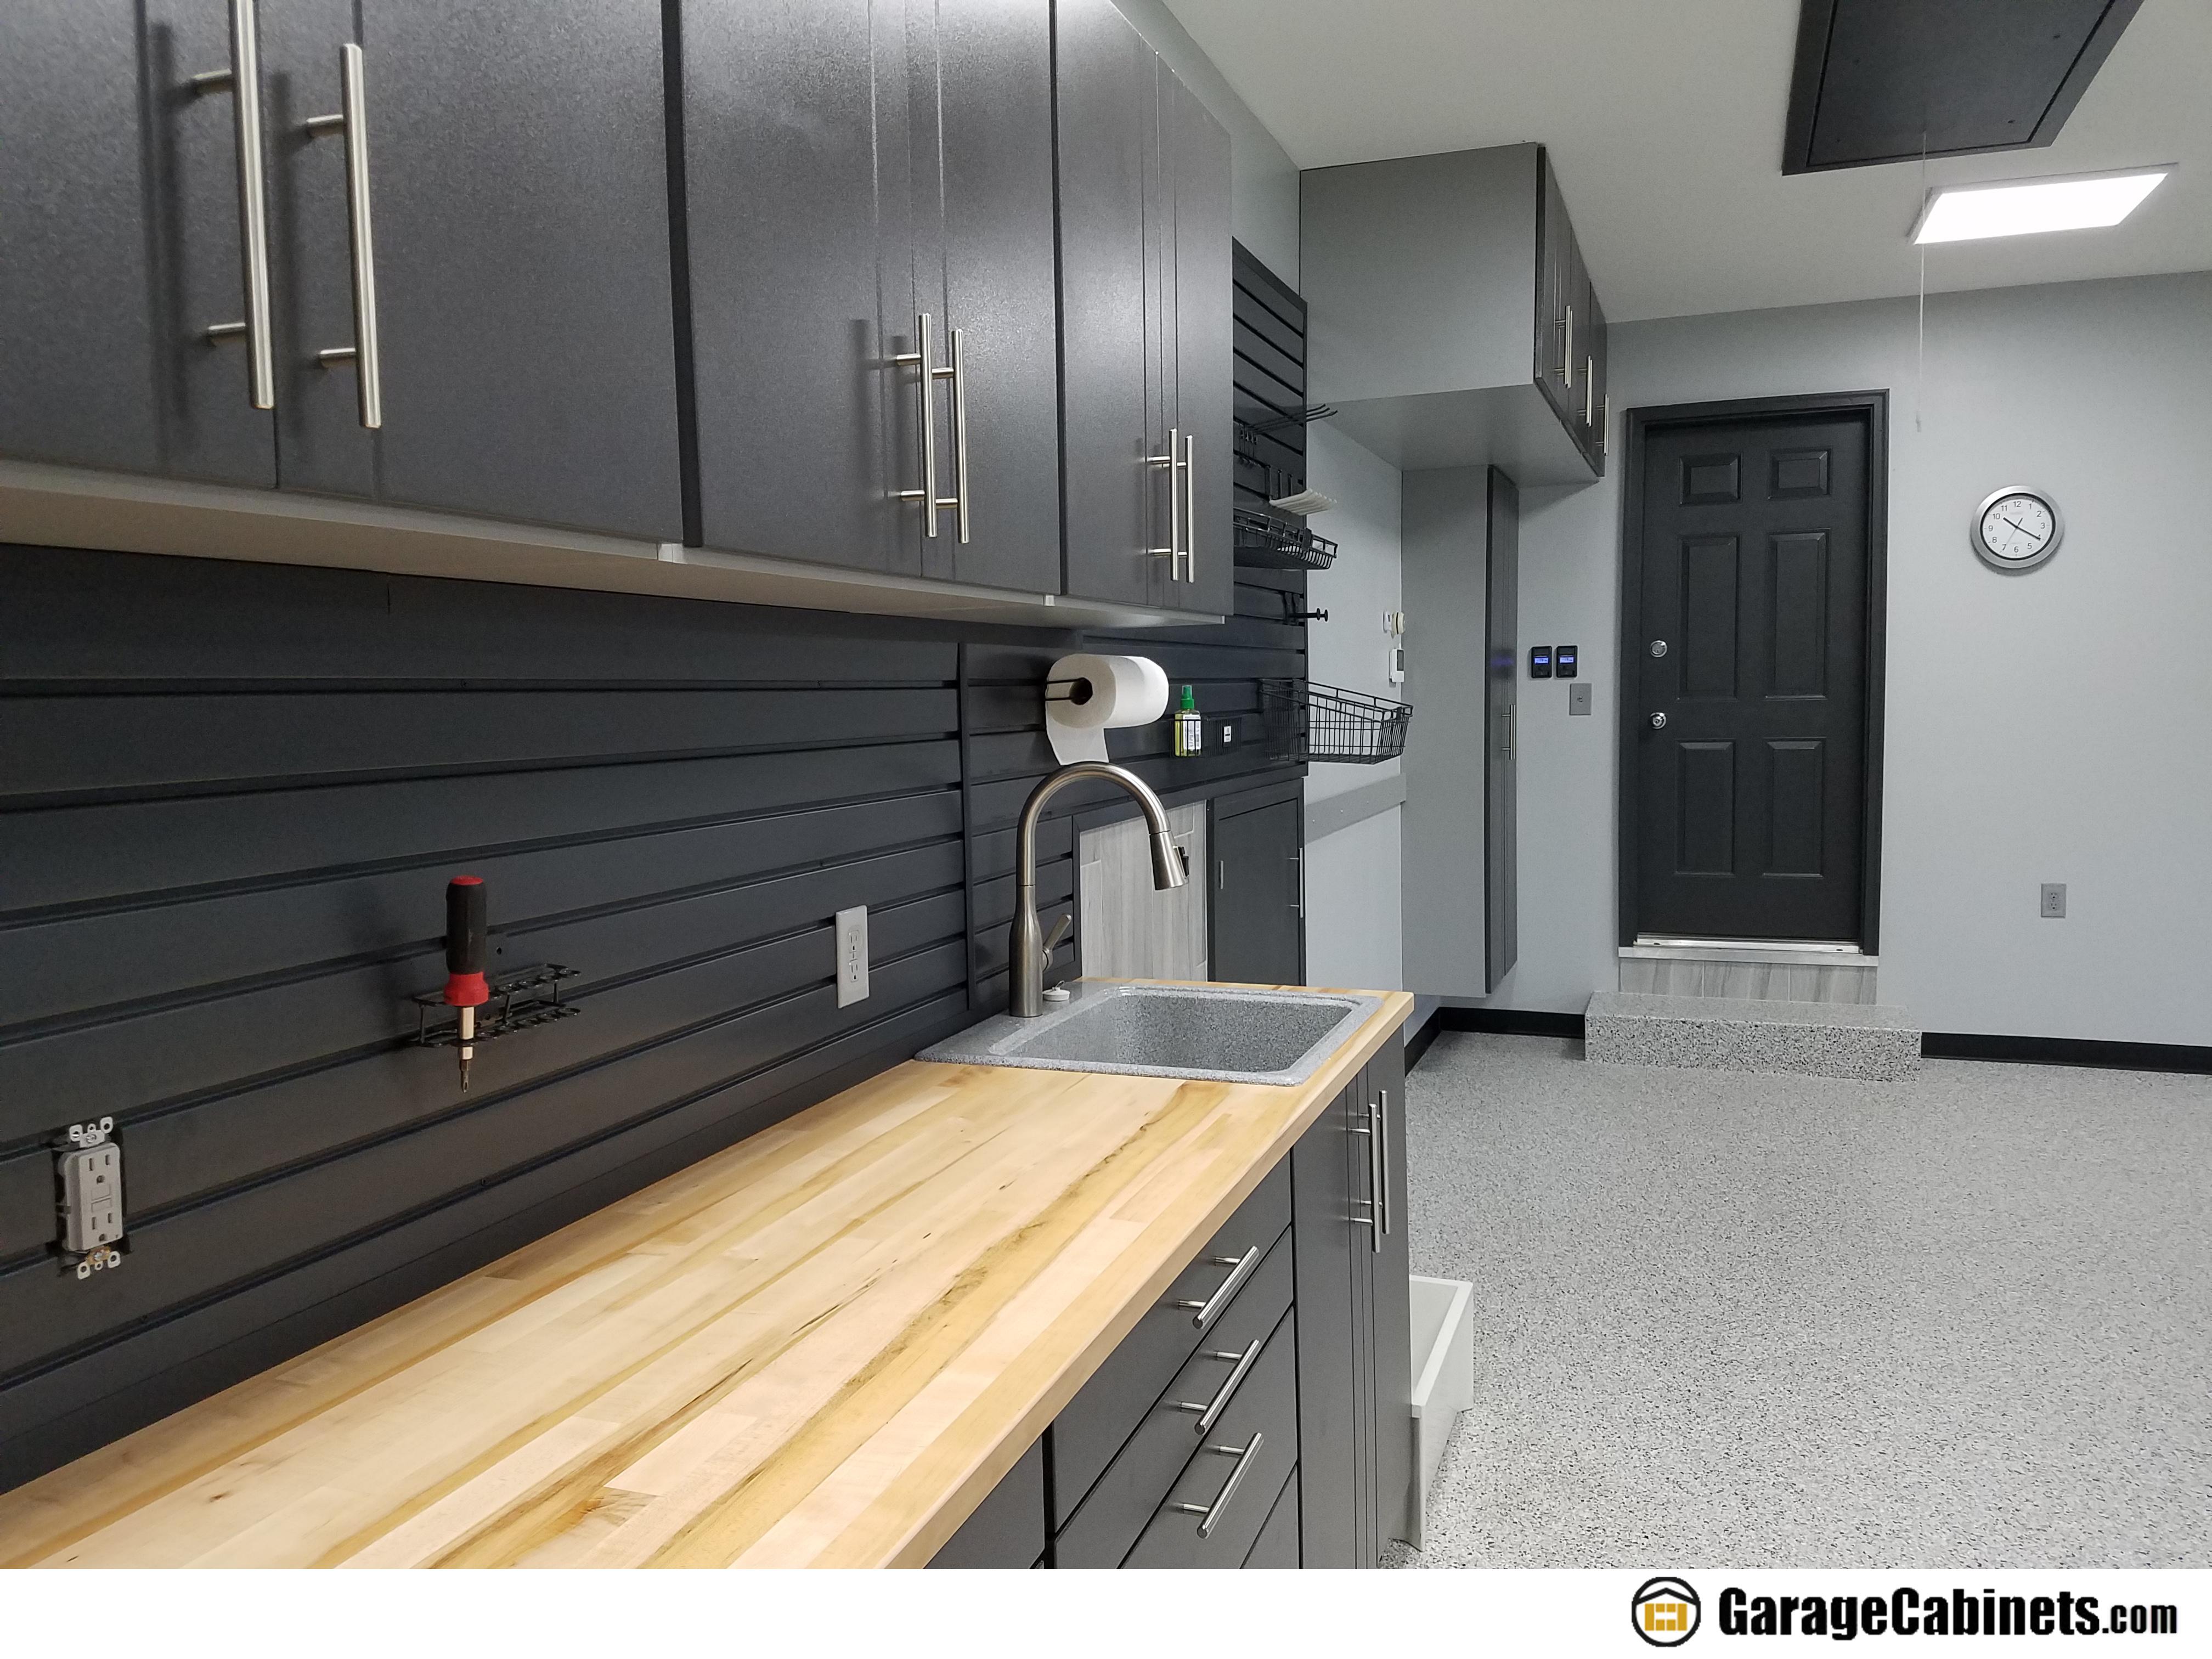 Astounding All Dream Garages Must Include A Garage Workbench With Storage Machost Co Dining Chair Design Ideas Machostcouk